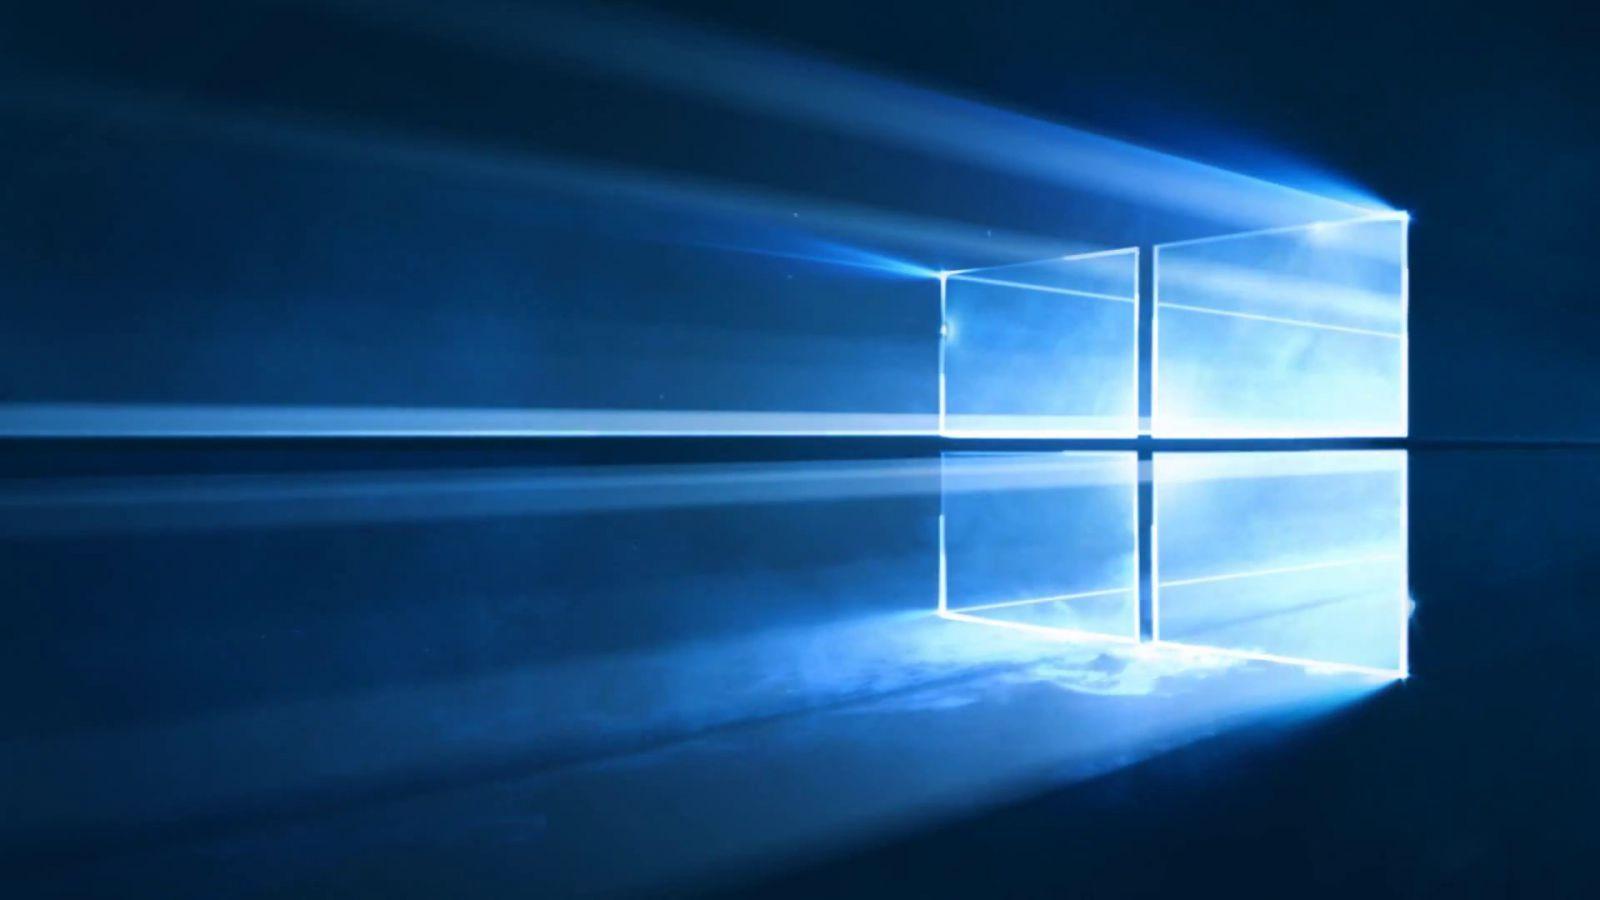 Windows 10 Hero 4k Wallpapers Top Free Windows 10 Hero 4k